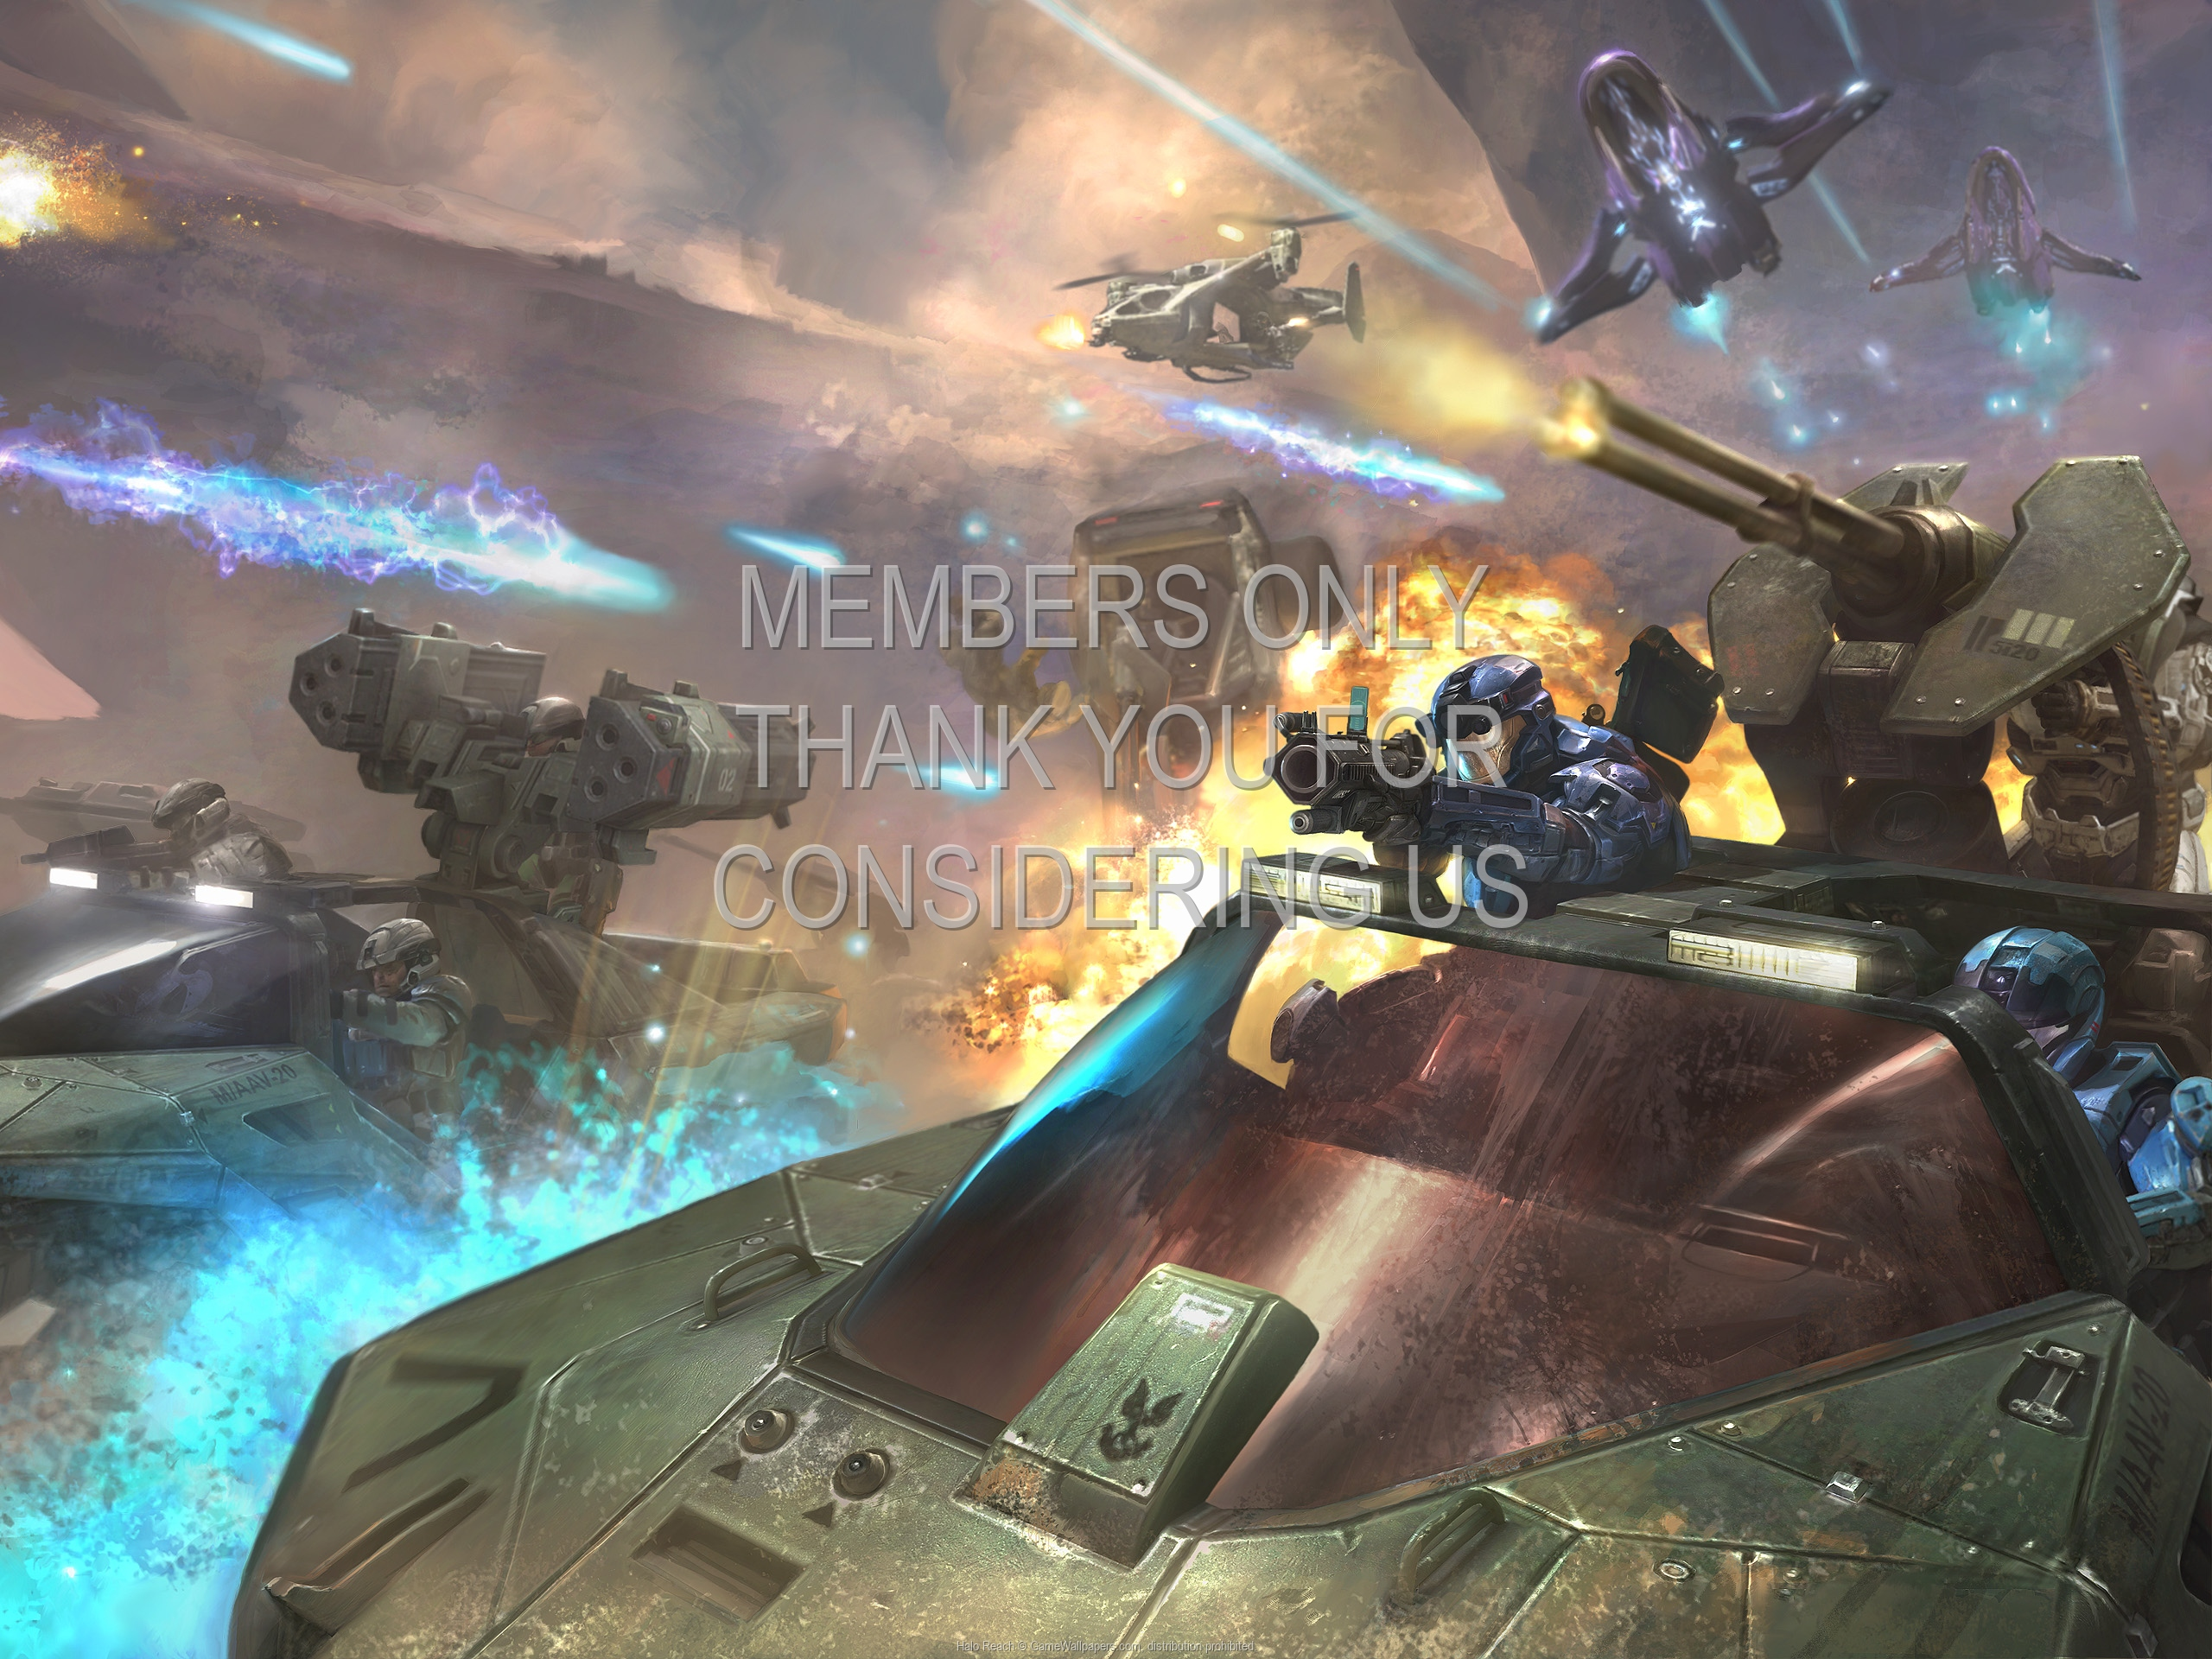 Halo: Reach 1920x1080 Móvil fondo de escritorio 07